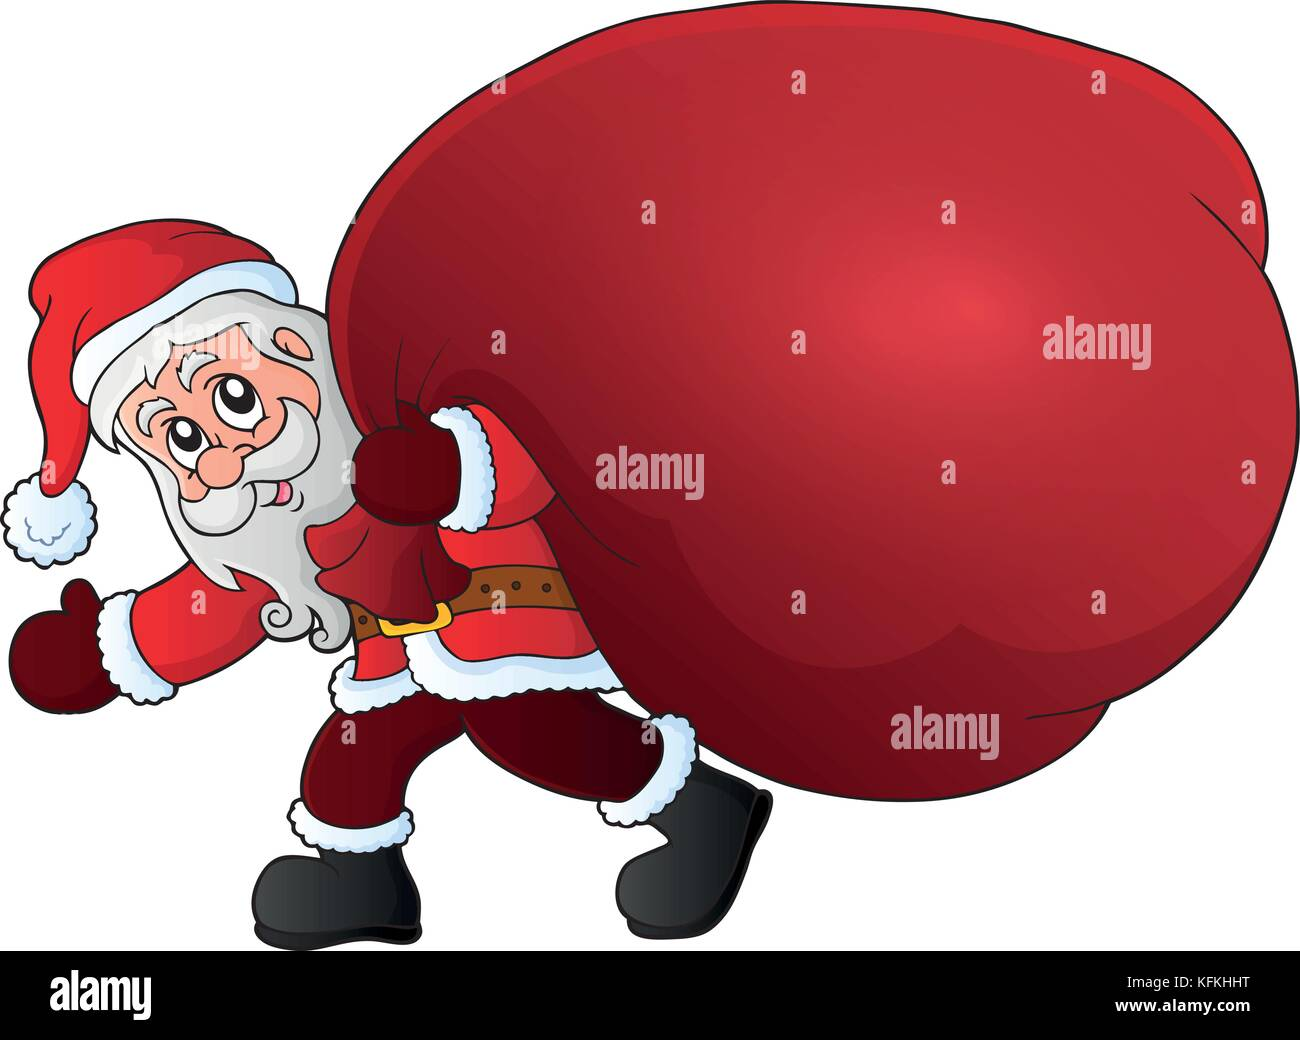 fdb4723ed1cb9 Santa Claus with big gift bag theme 1 - eps10 vector illustration. - Stock  Vector